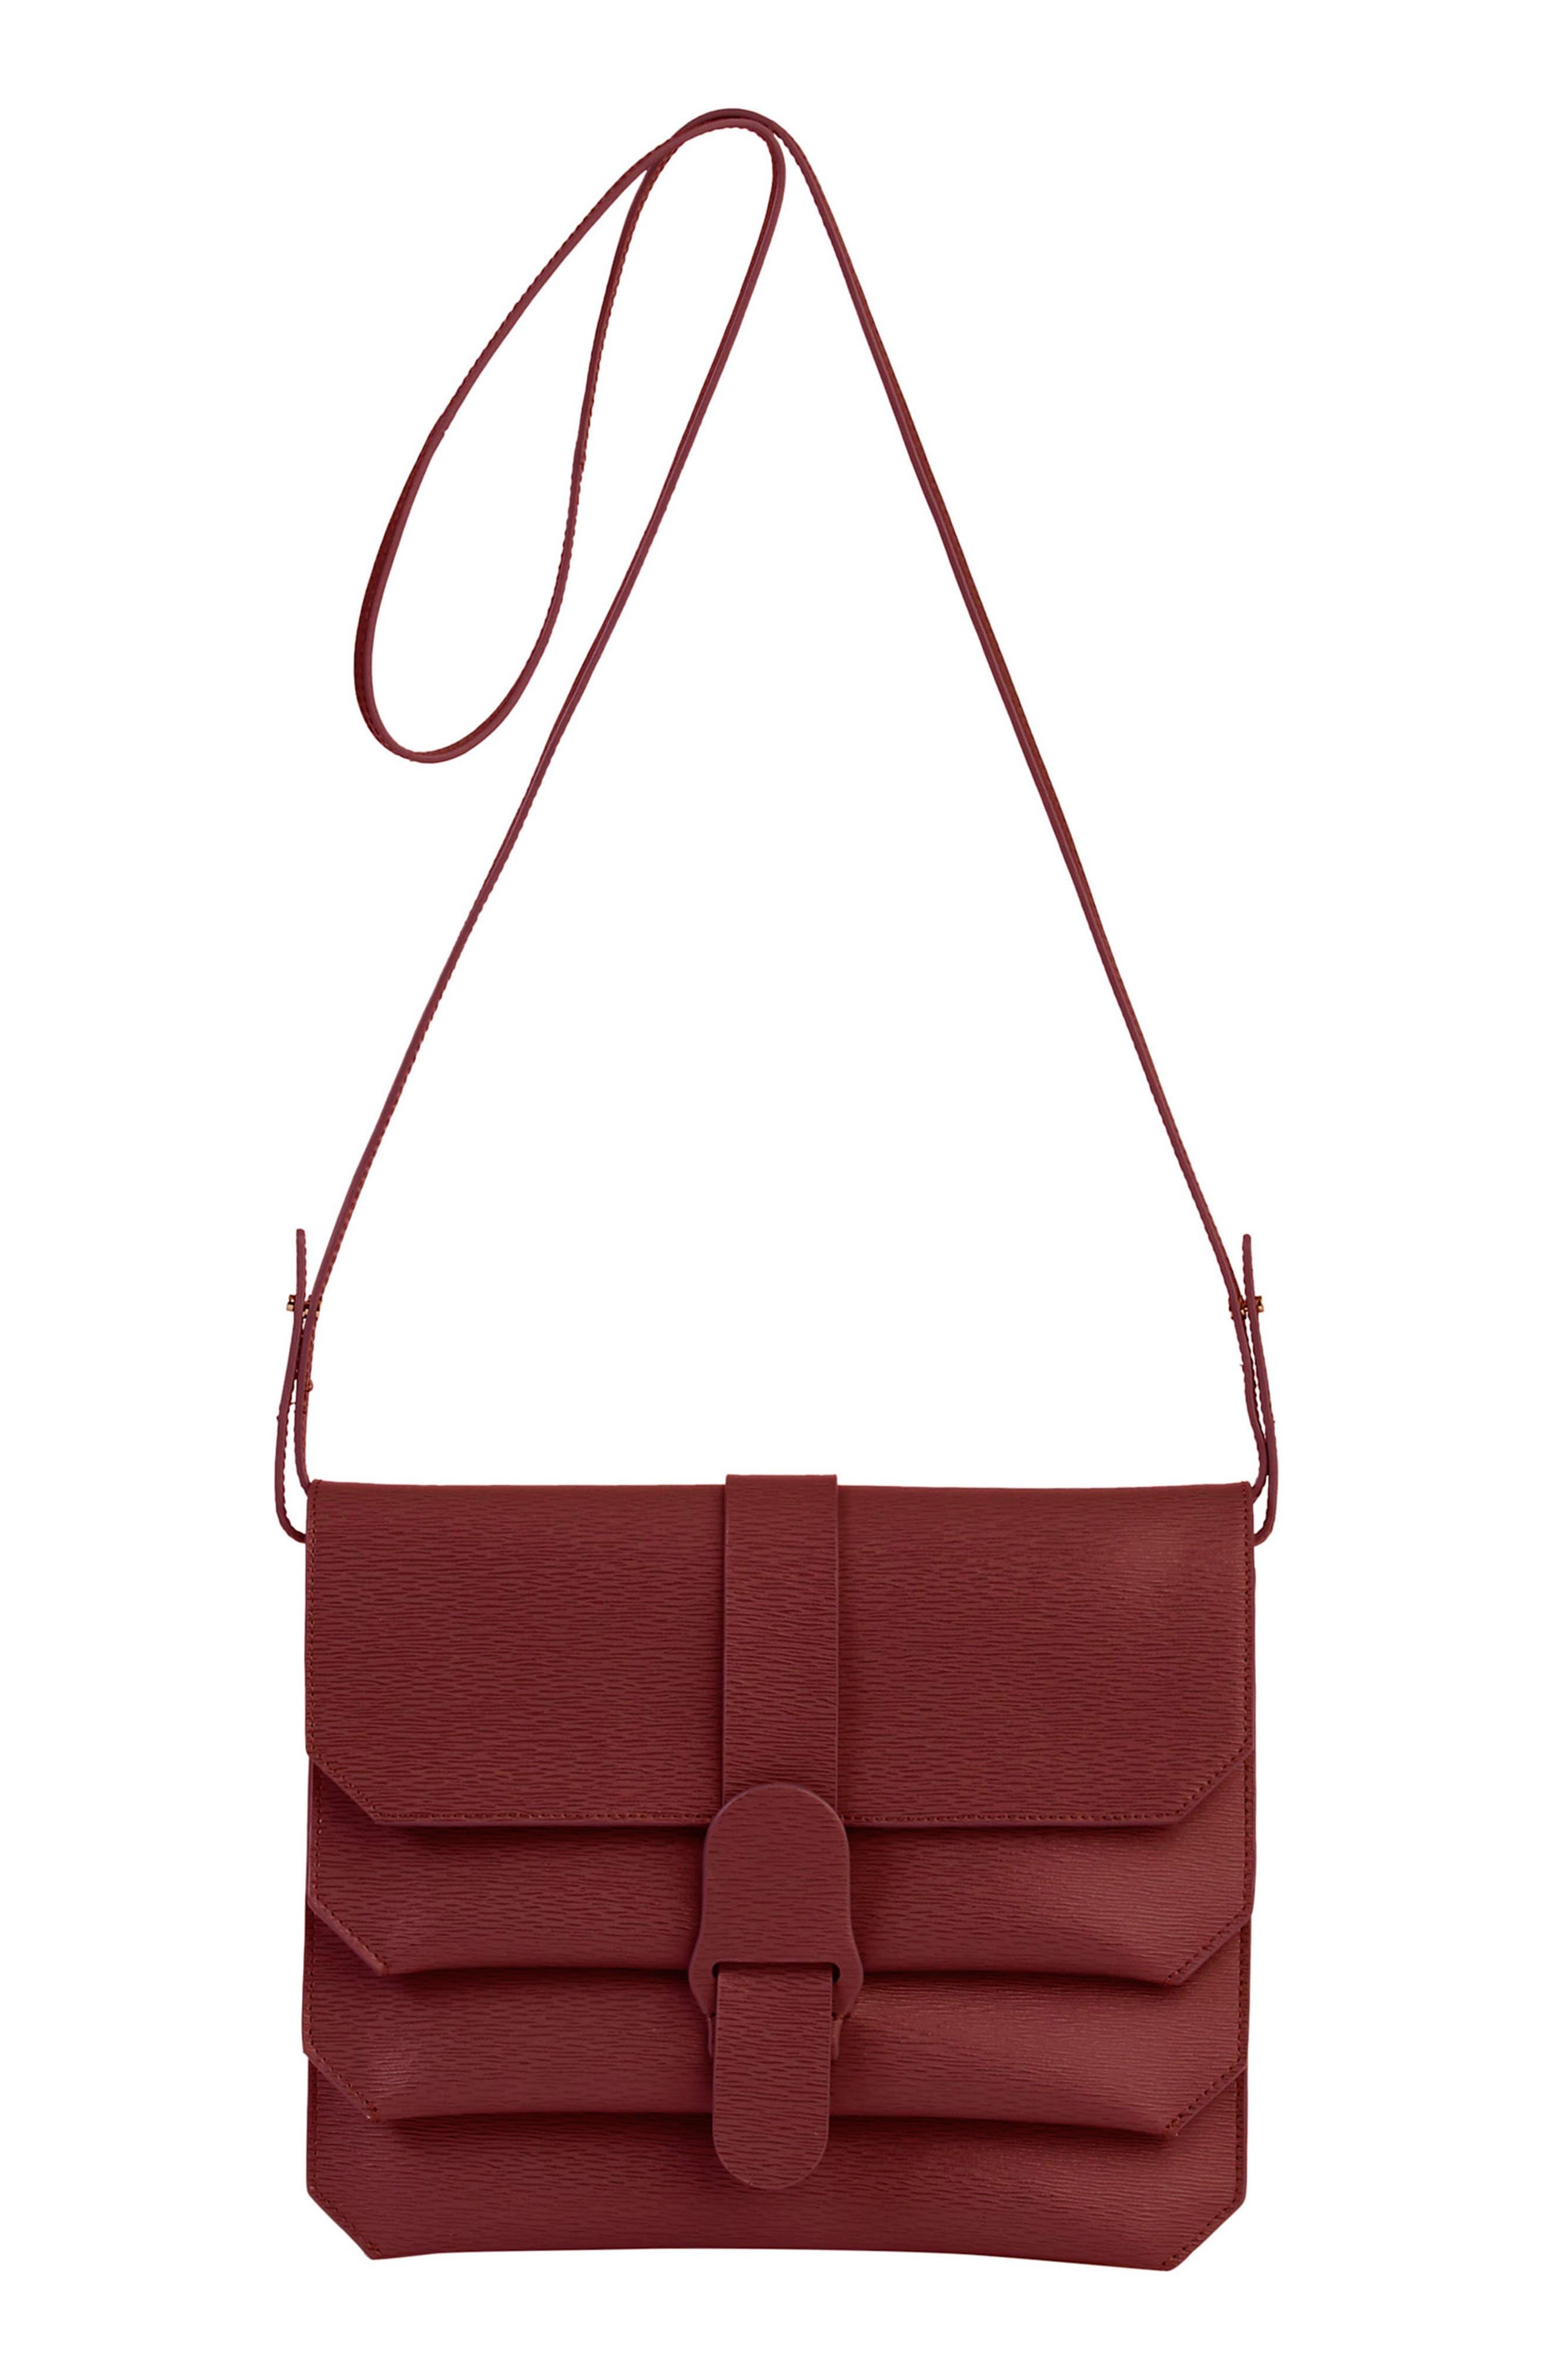 Main Image - Senreve Mimosa Textured Leather Crossbody Bag